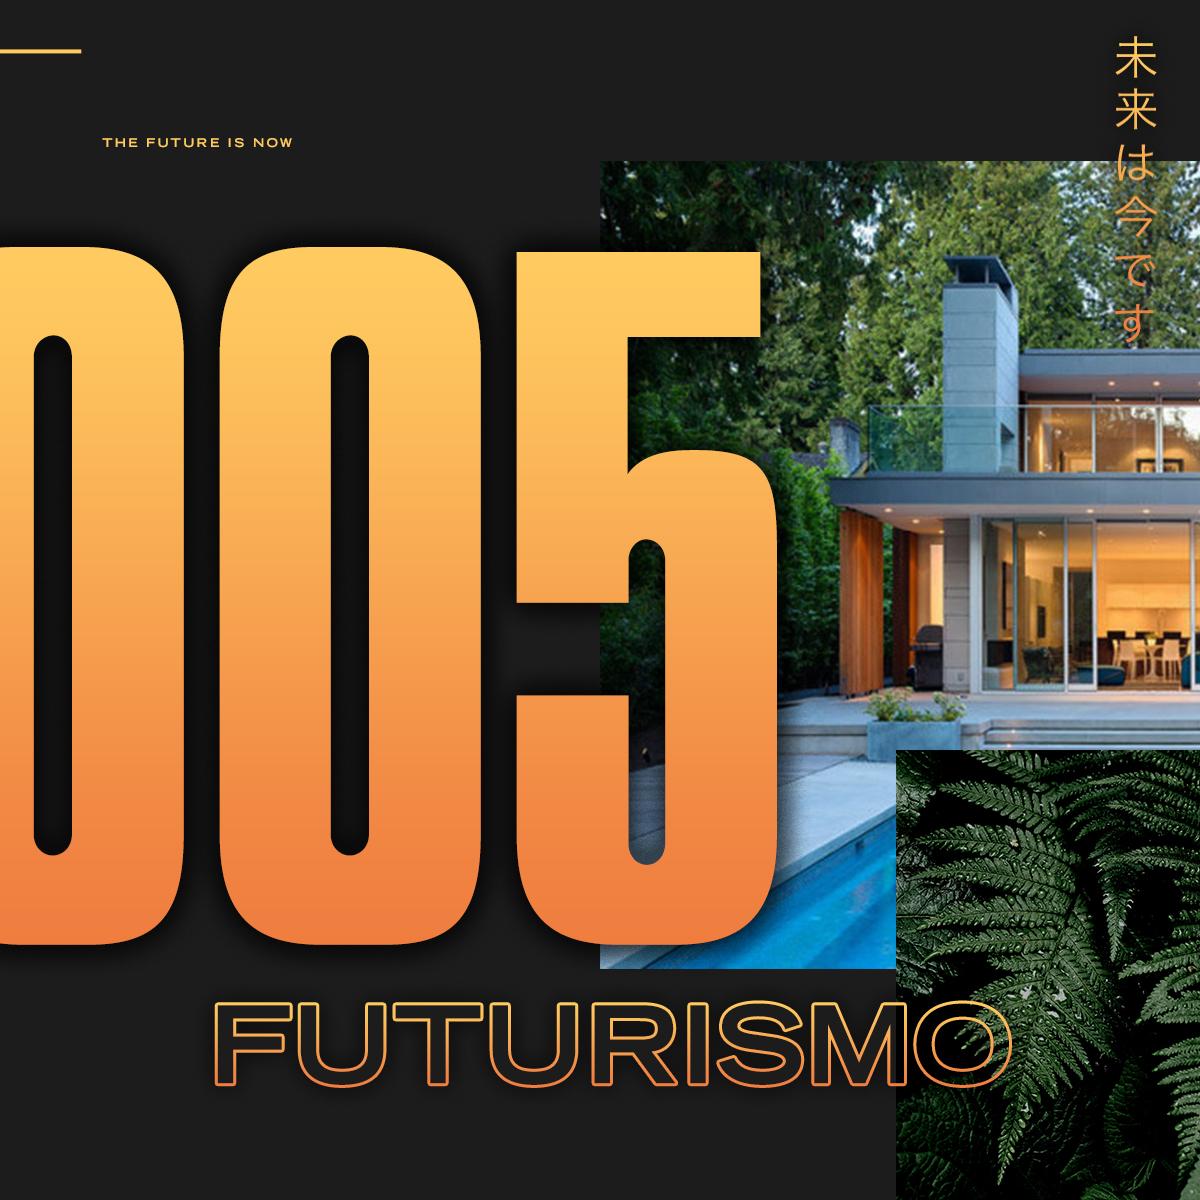 FUTURISMO_5.jpg